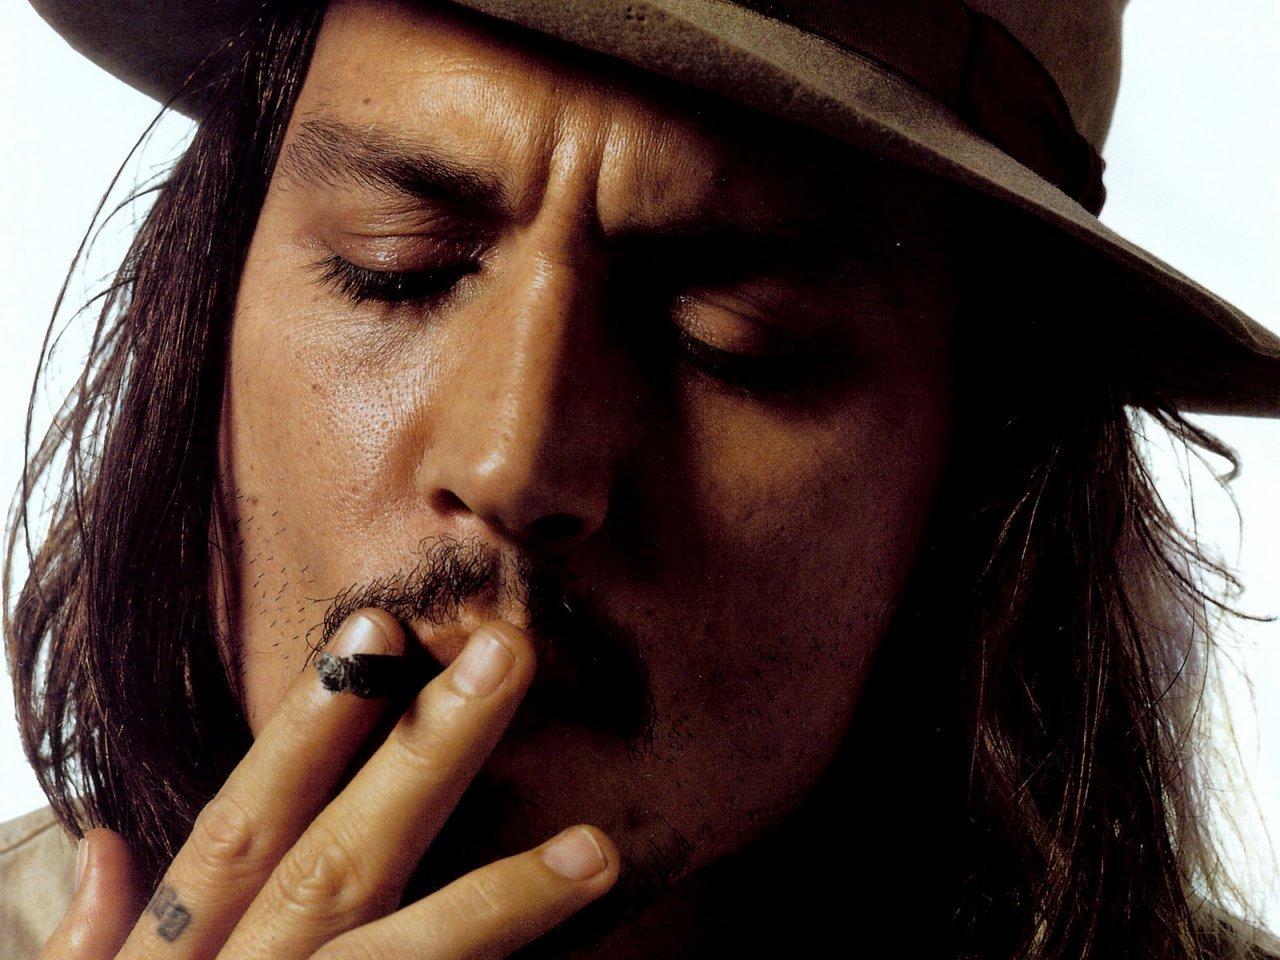 Johnny Depp Wallpaper Desktop Wallpapers 1280x960